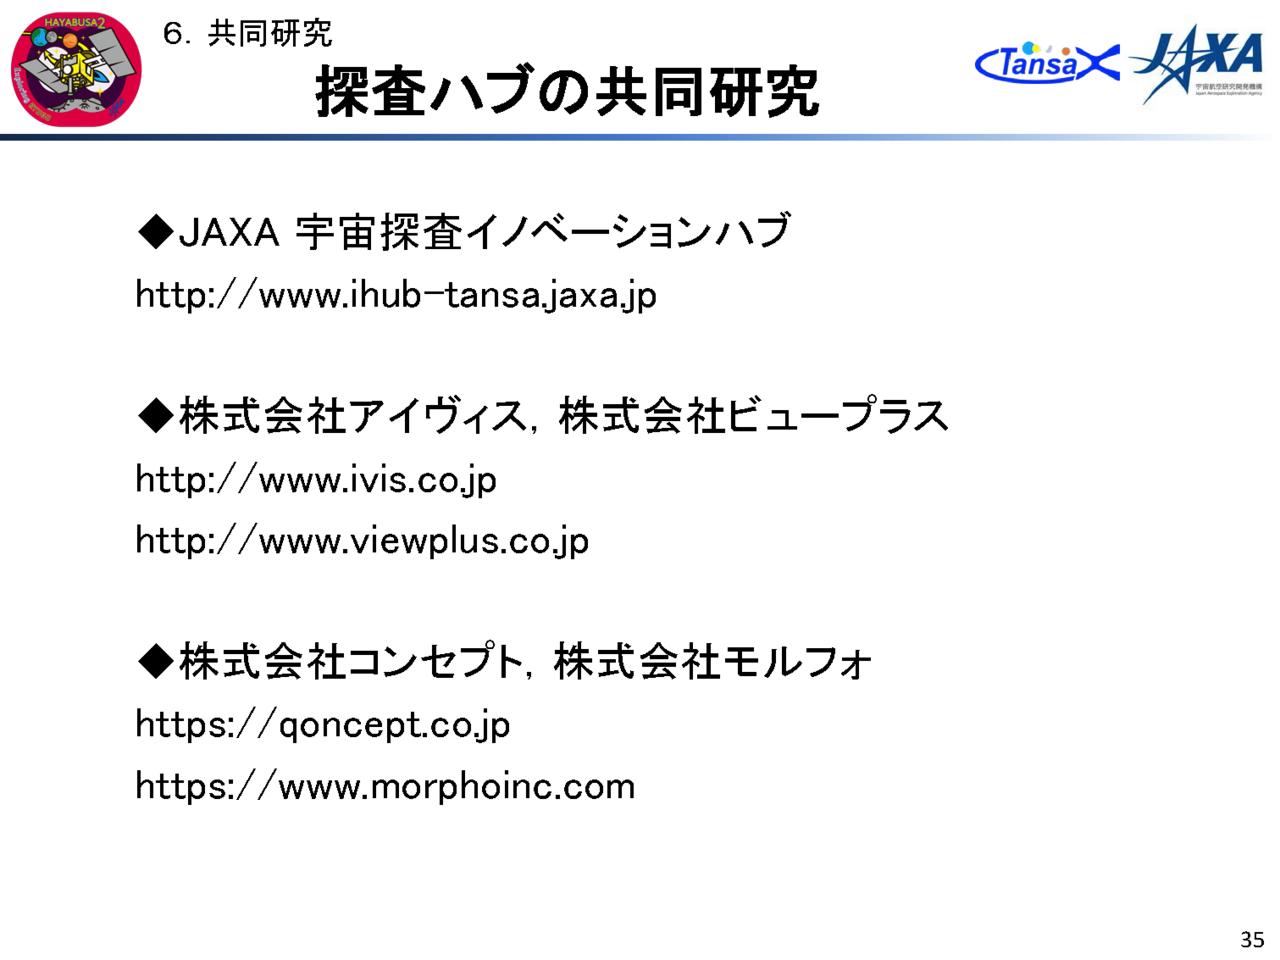 f:id:Imamura:20180802145955p:plain